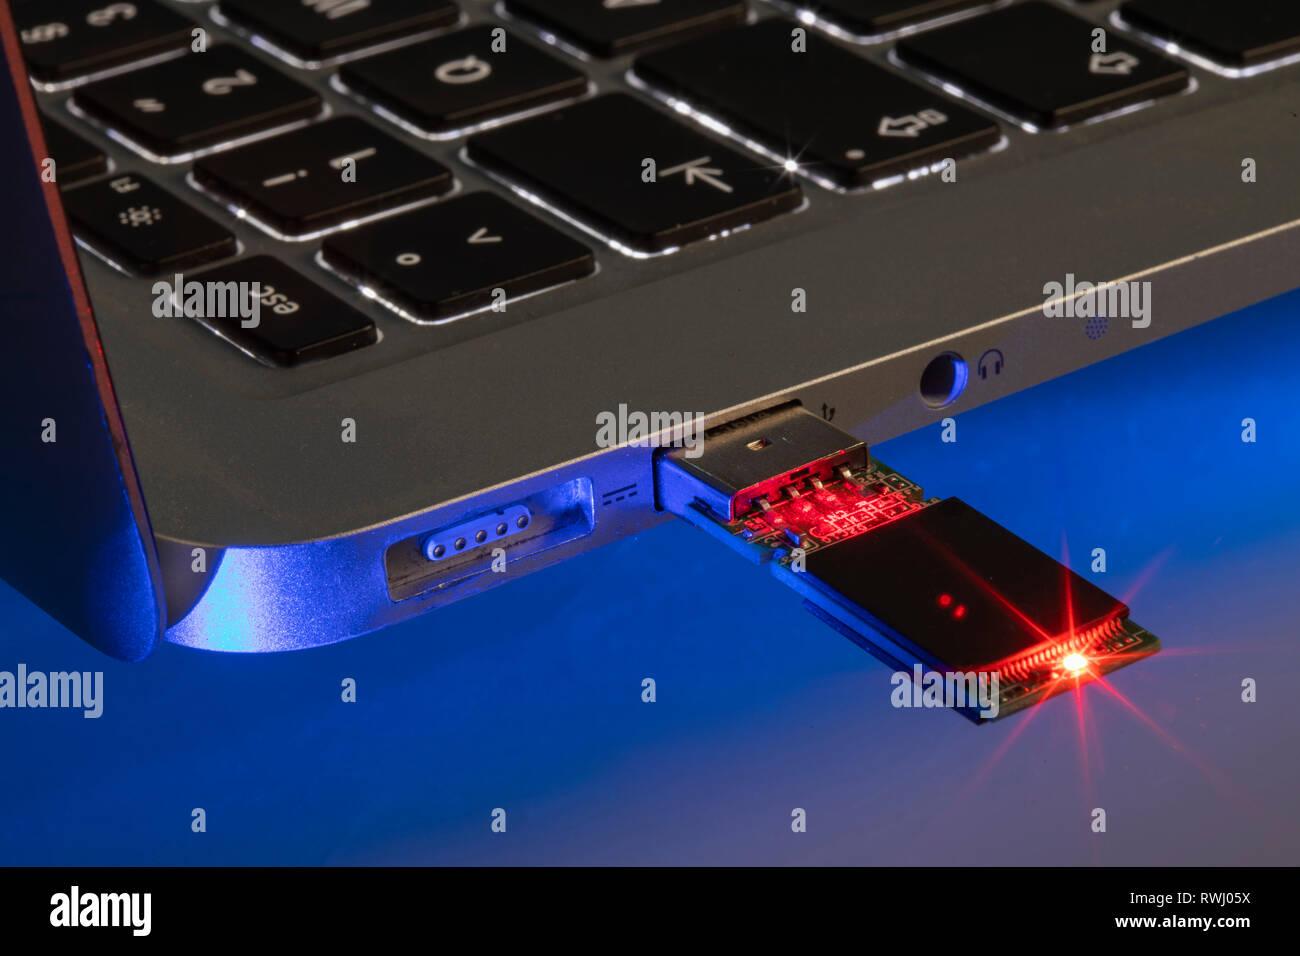 Memoria USB en un ordenador portátil, Foto de stock